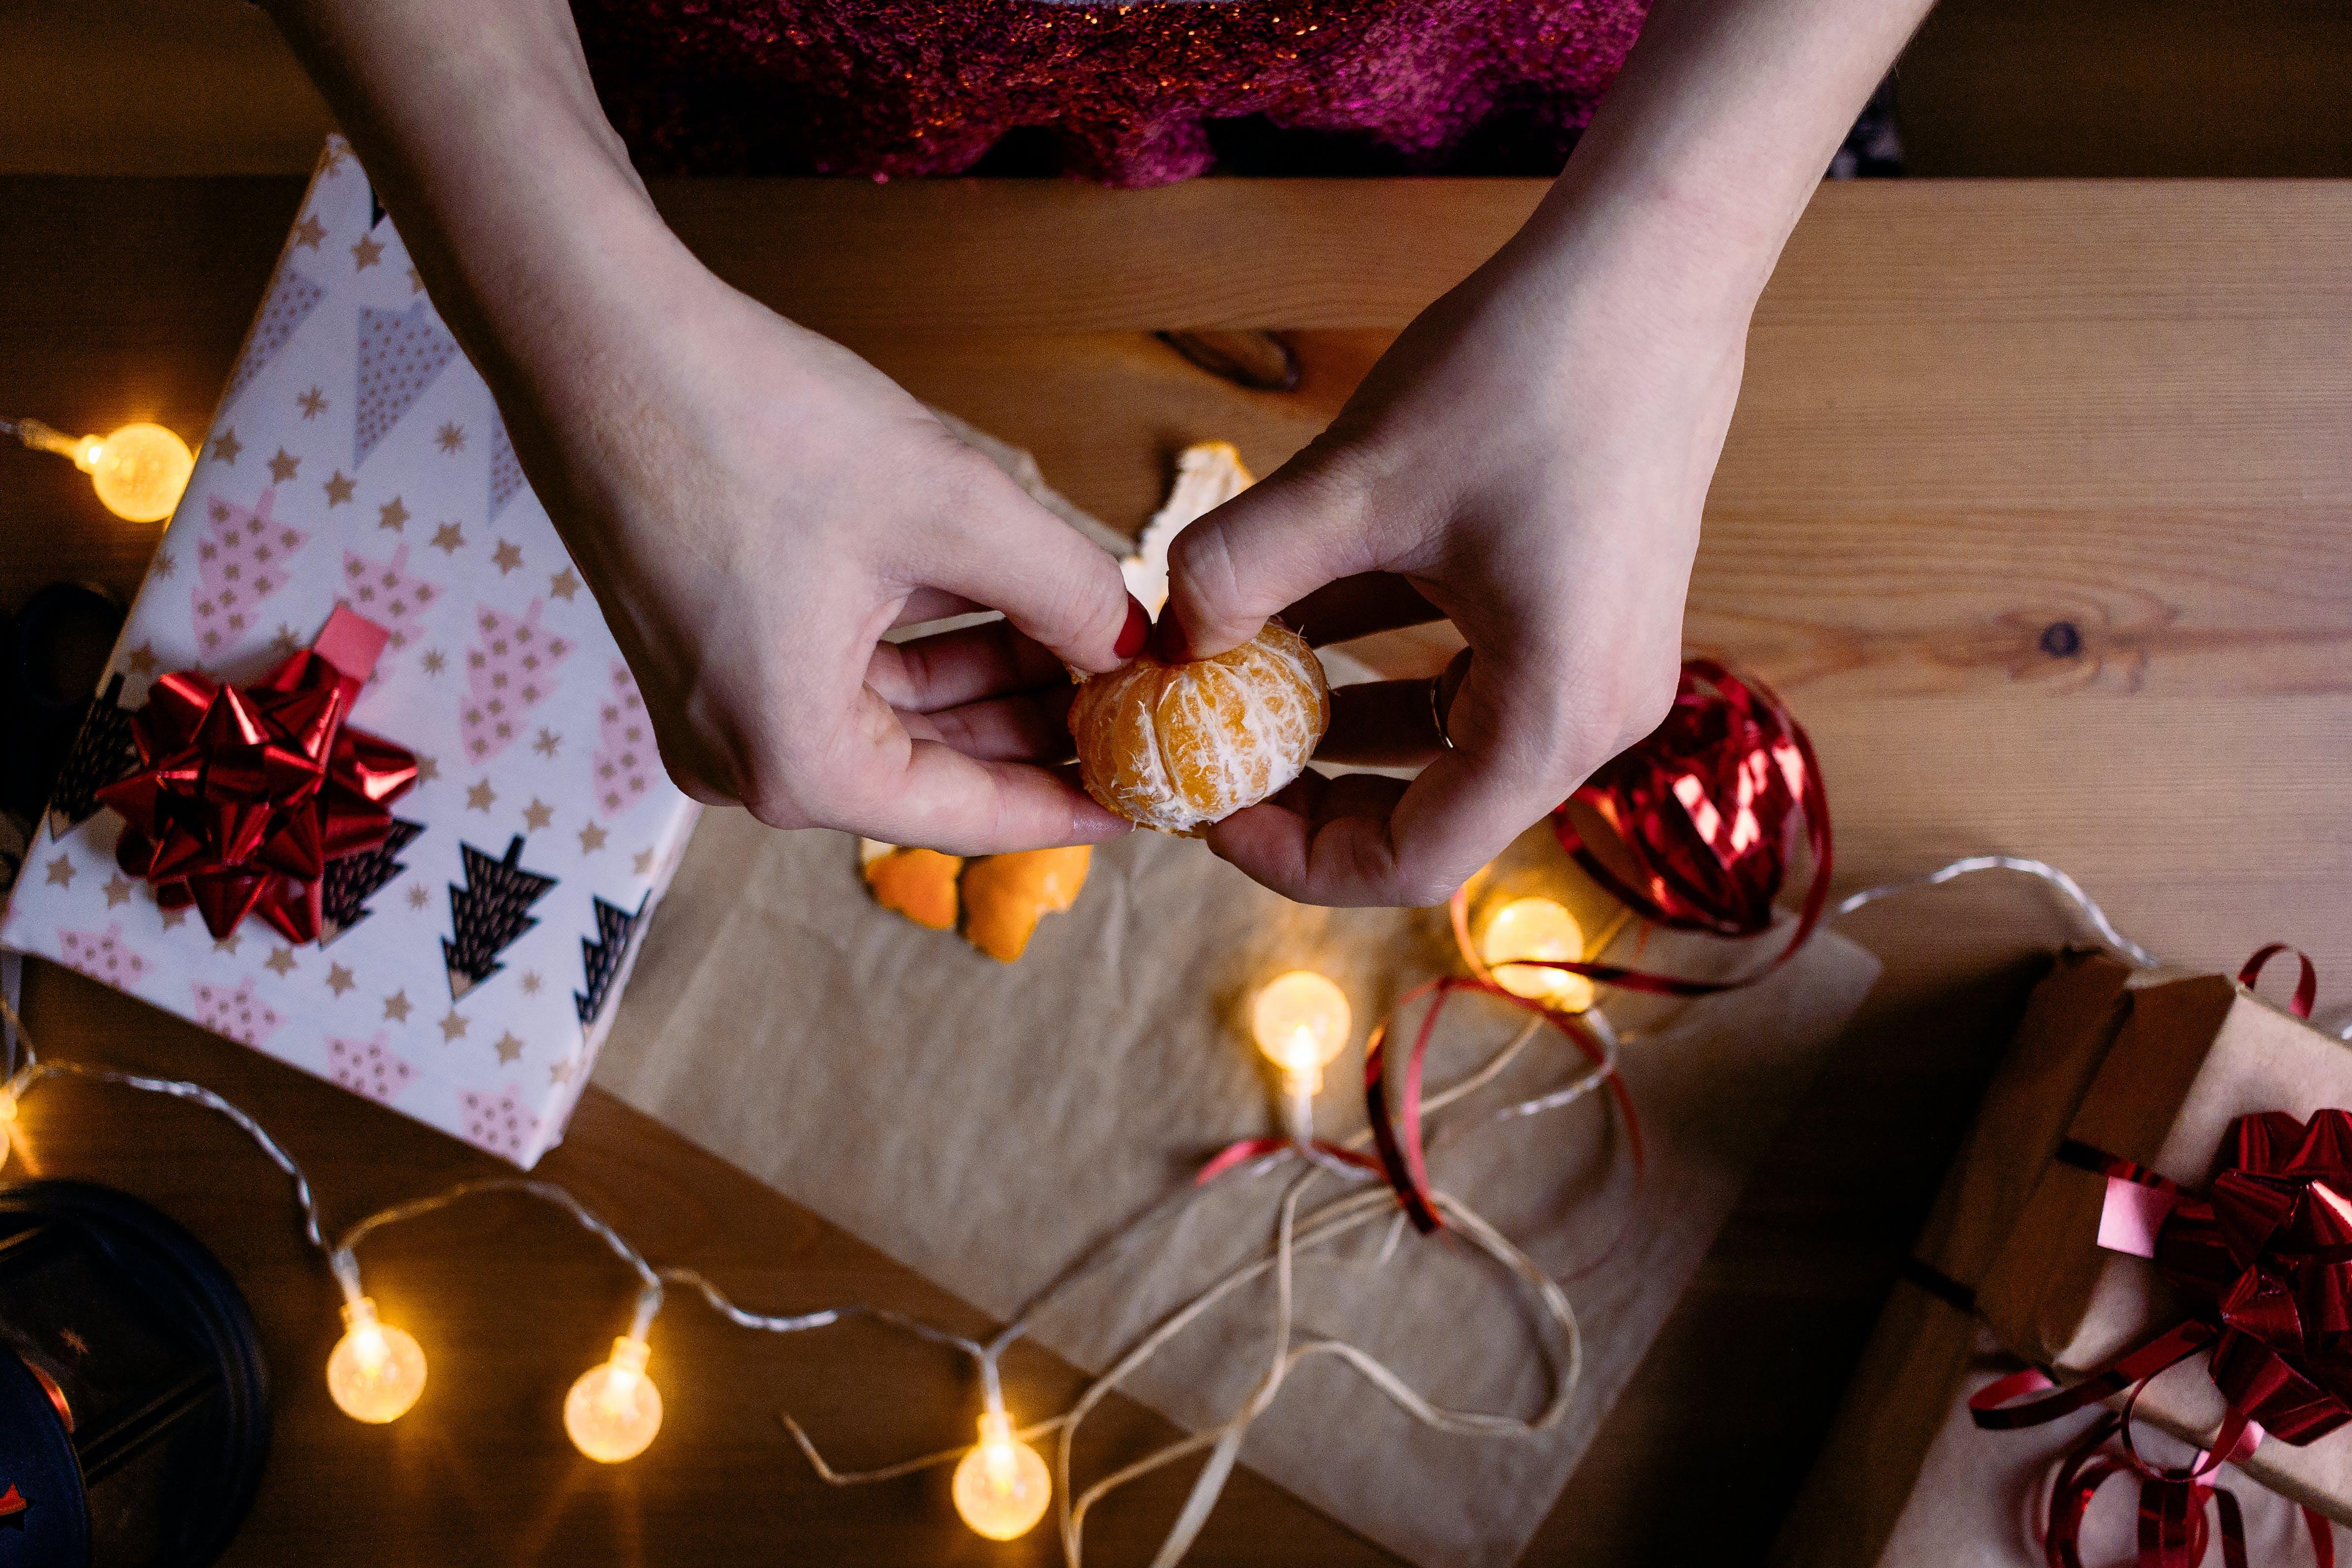 Fotos de stock gratuitas de adentro, cinta, Fruta, guirnalda de luces